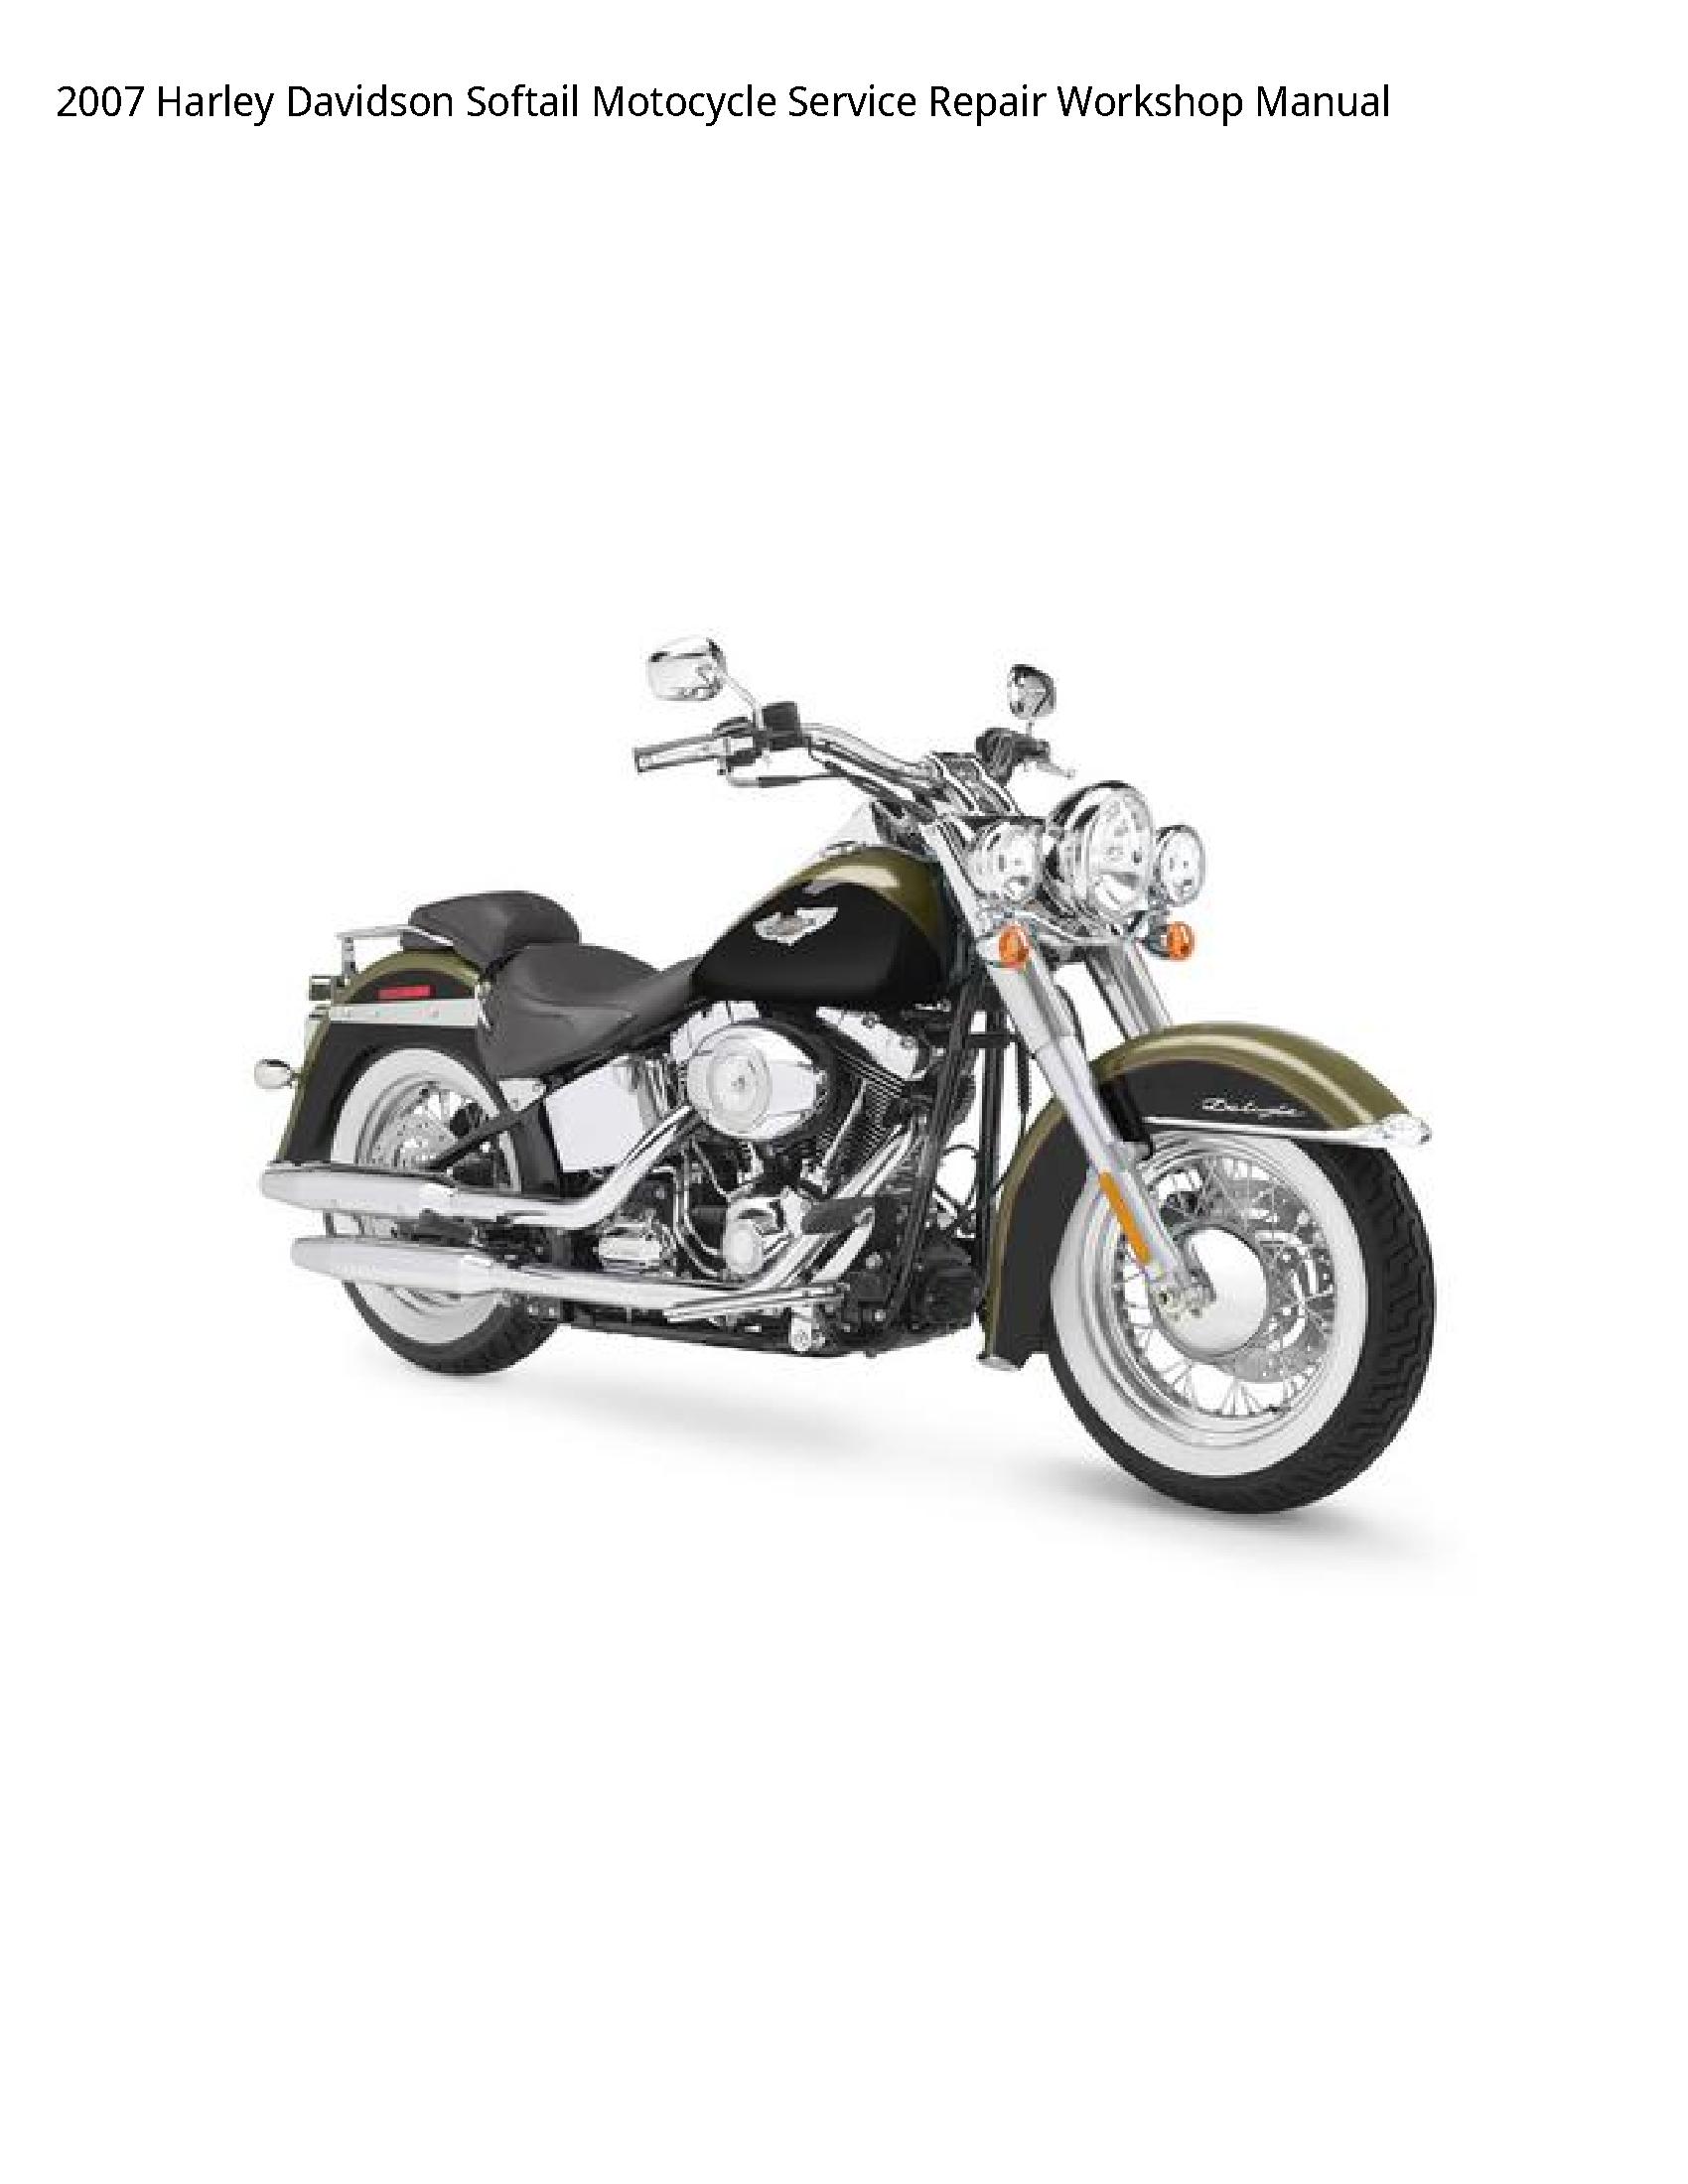 Harley Davidson Softail Motocycle manual